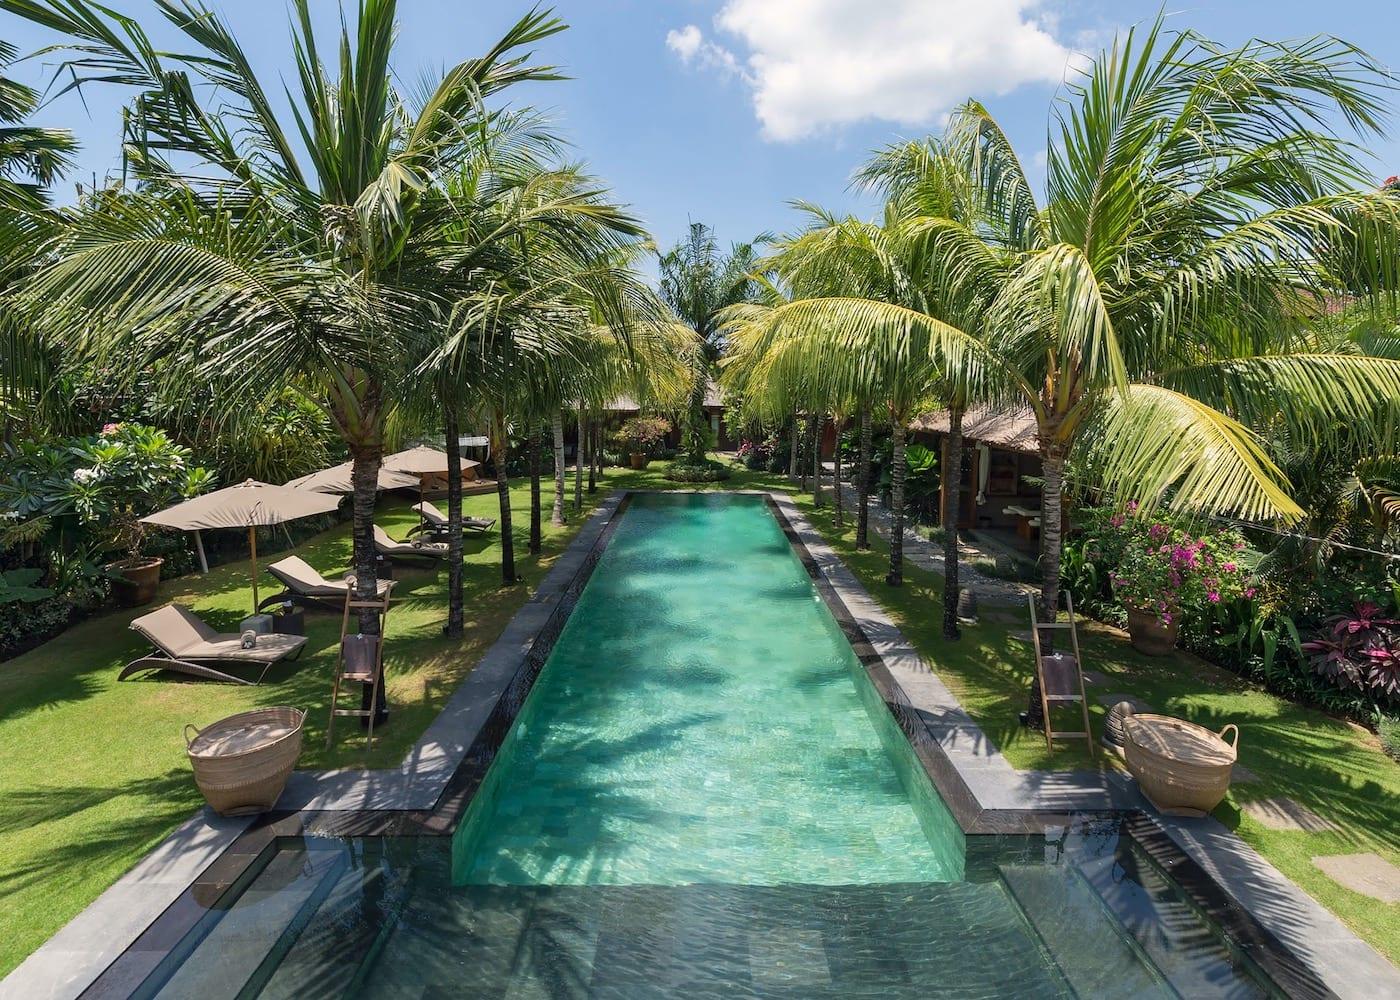 Inside Villa Shambhala - one of the best private villas in Seminyak, Bali, Indonesia